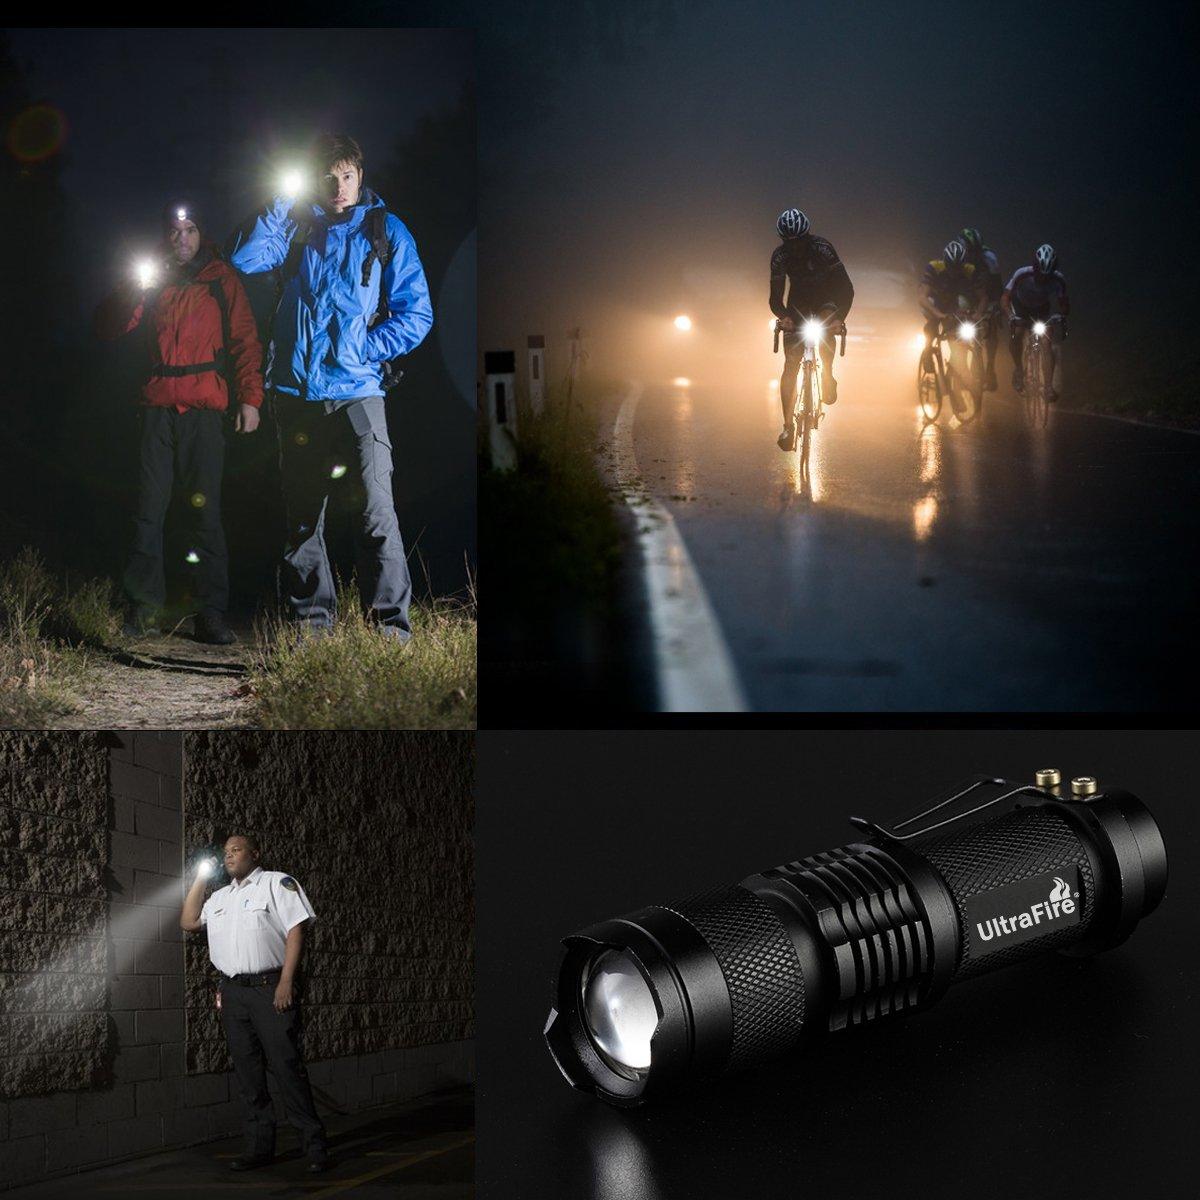 3 Pack UltraFire Mini Flashlights Focus Adjustable SK68 Single Mode Tactical LED Flashlight, Ultra Bright 300 Lumens Torch by ULTRAFIRE (Image #7)